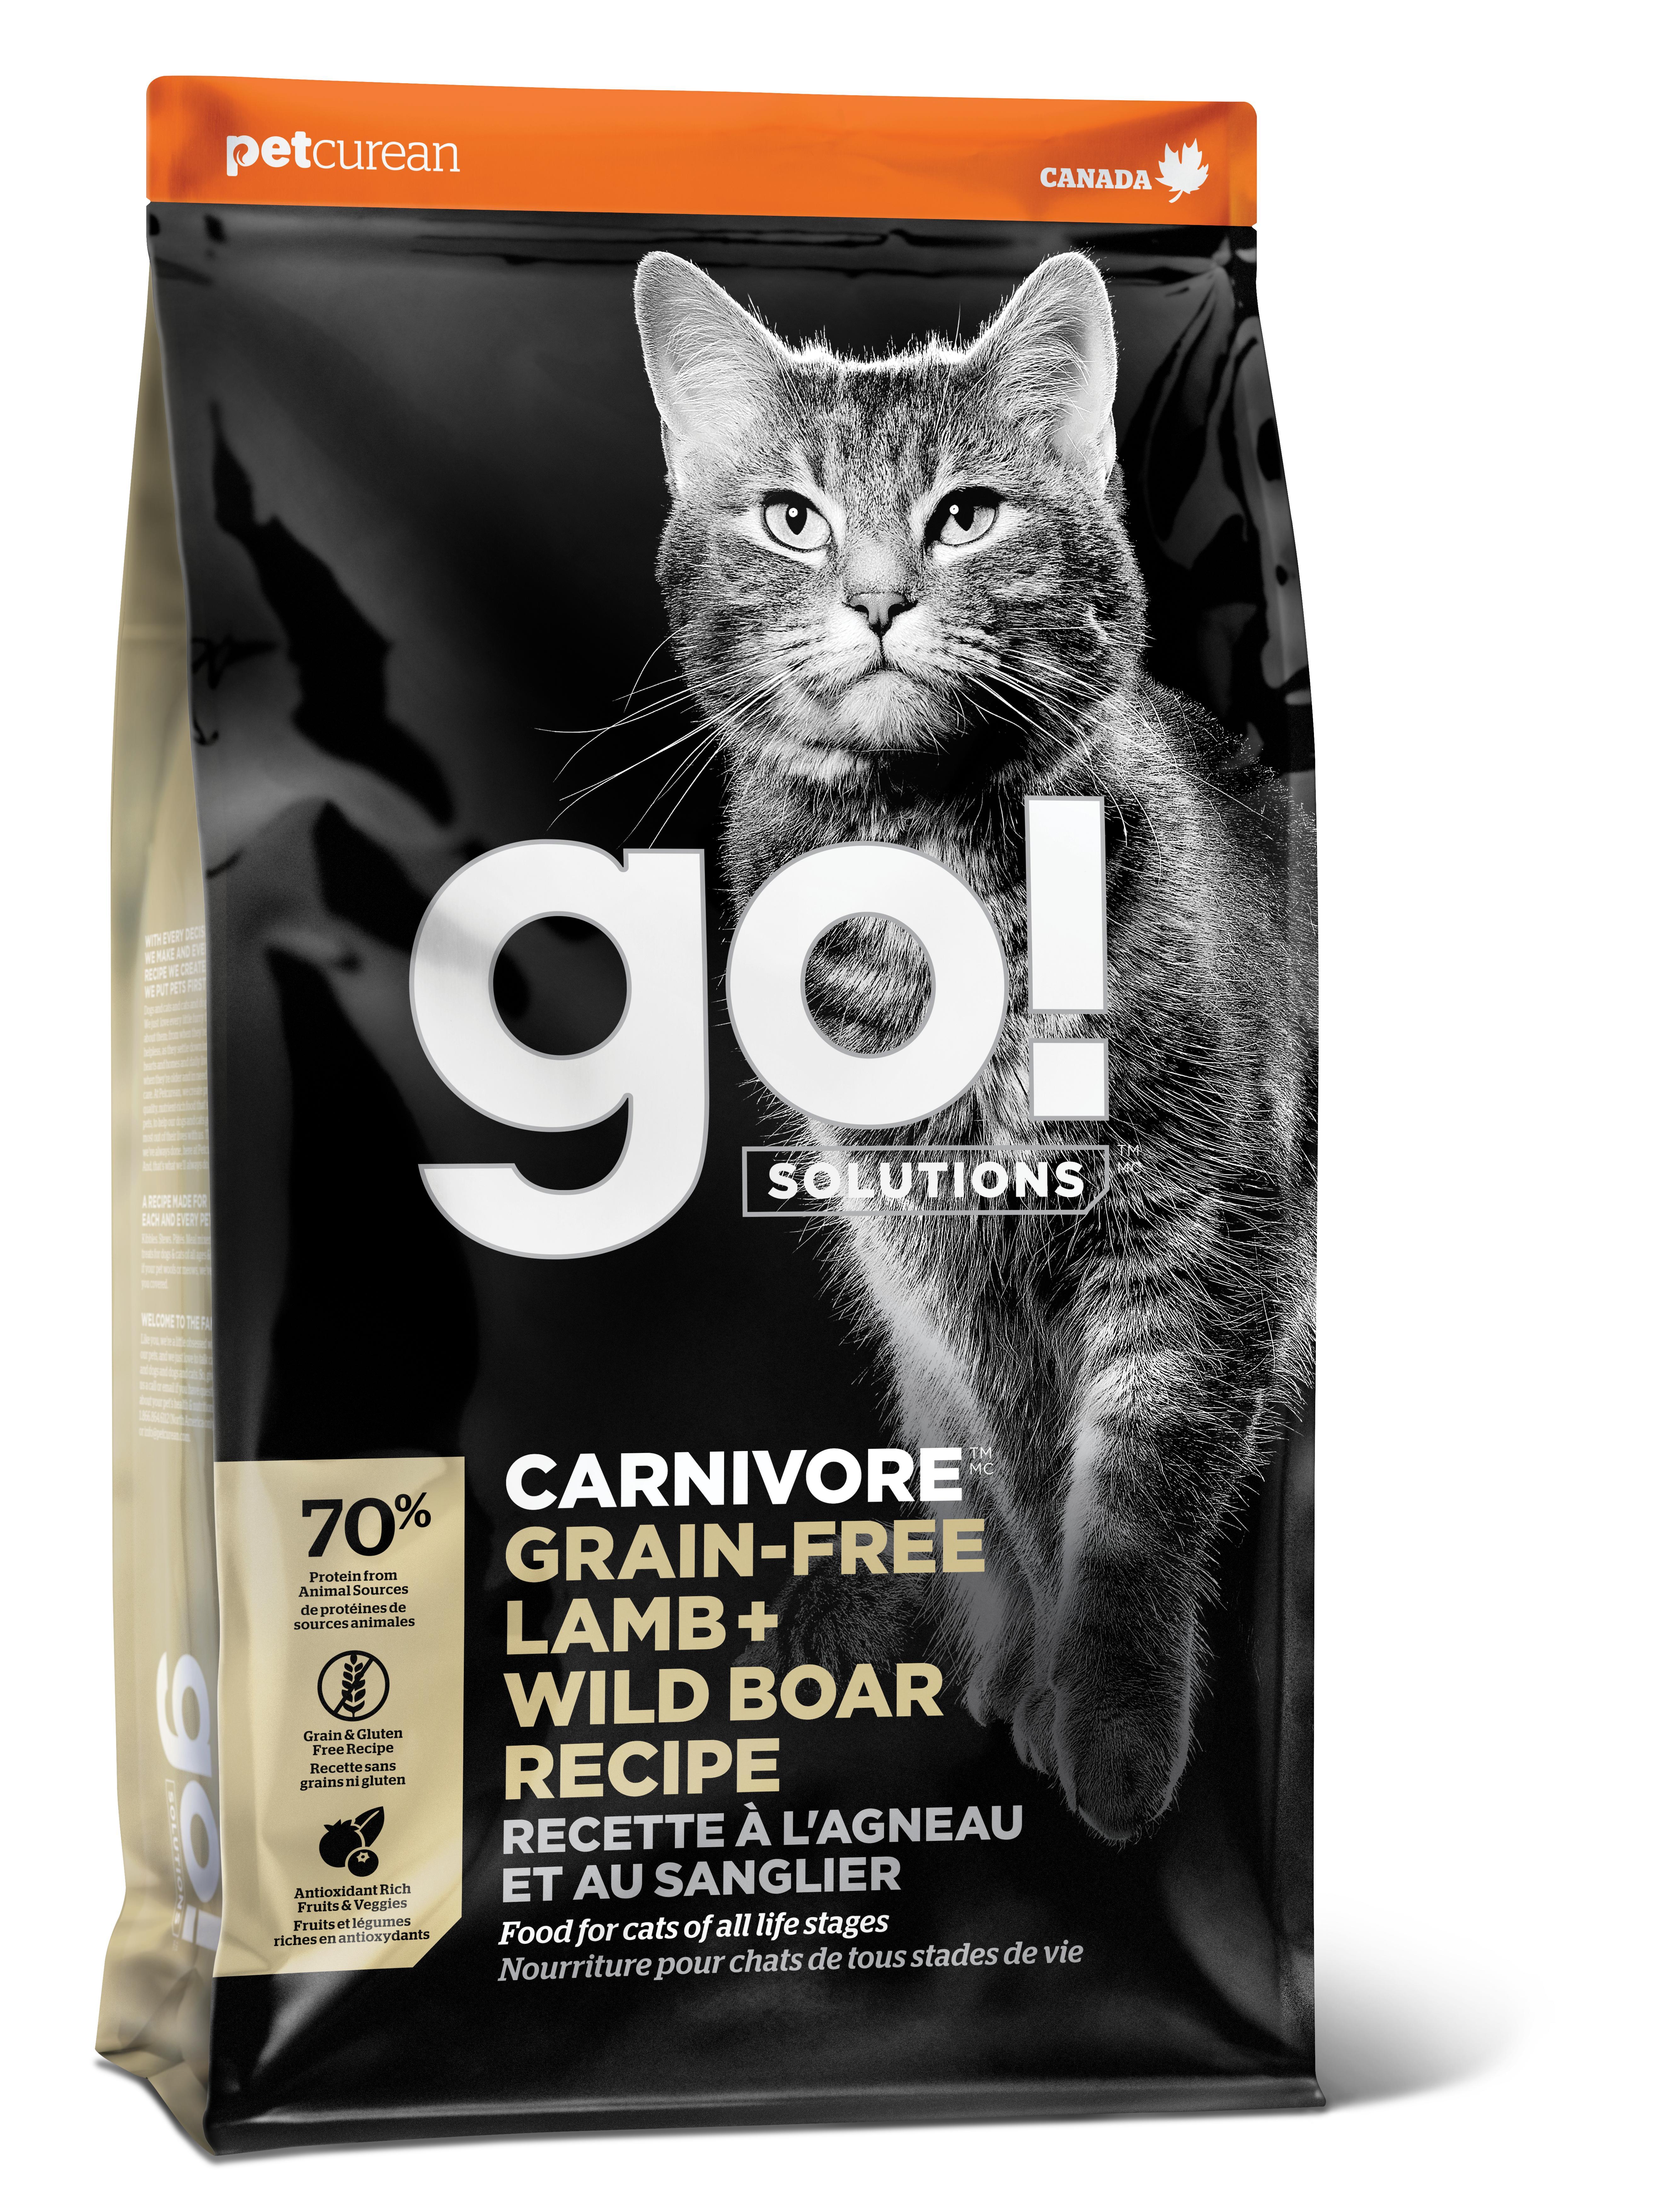 Go! Solutions Carnivore Lamb + Wild Boar Grain-Free Dry Cat Food Image